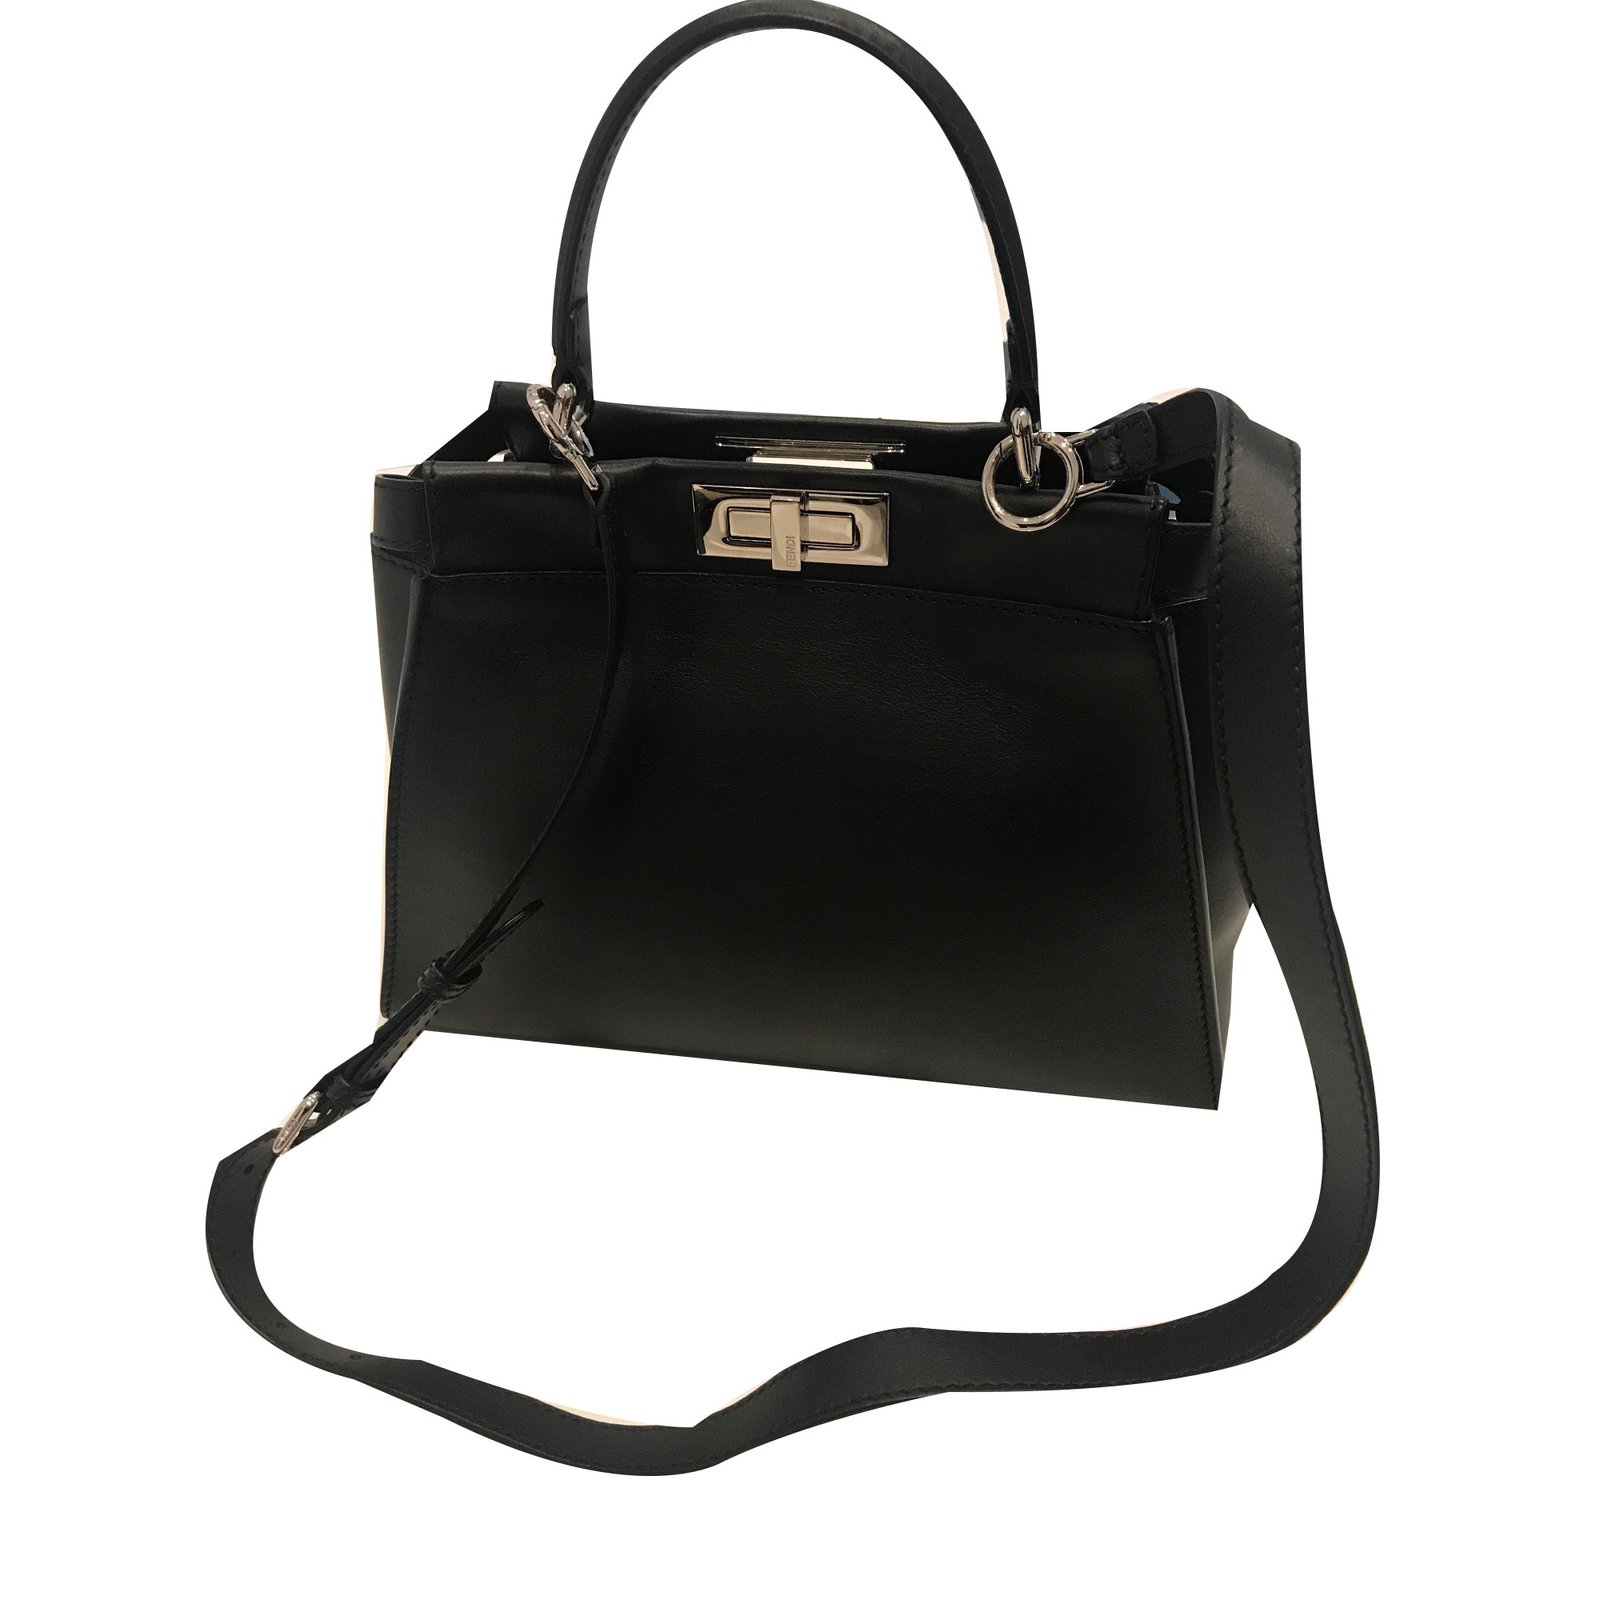 47c47de141c7 Fendi Peekaboo Handbags Leather Black ref.54969 - Joli Closet